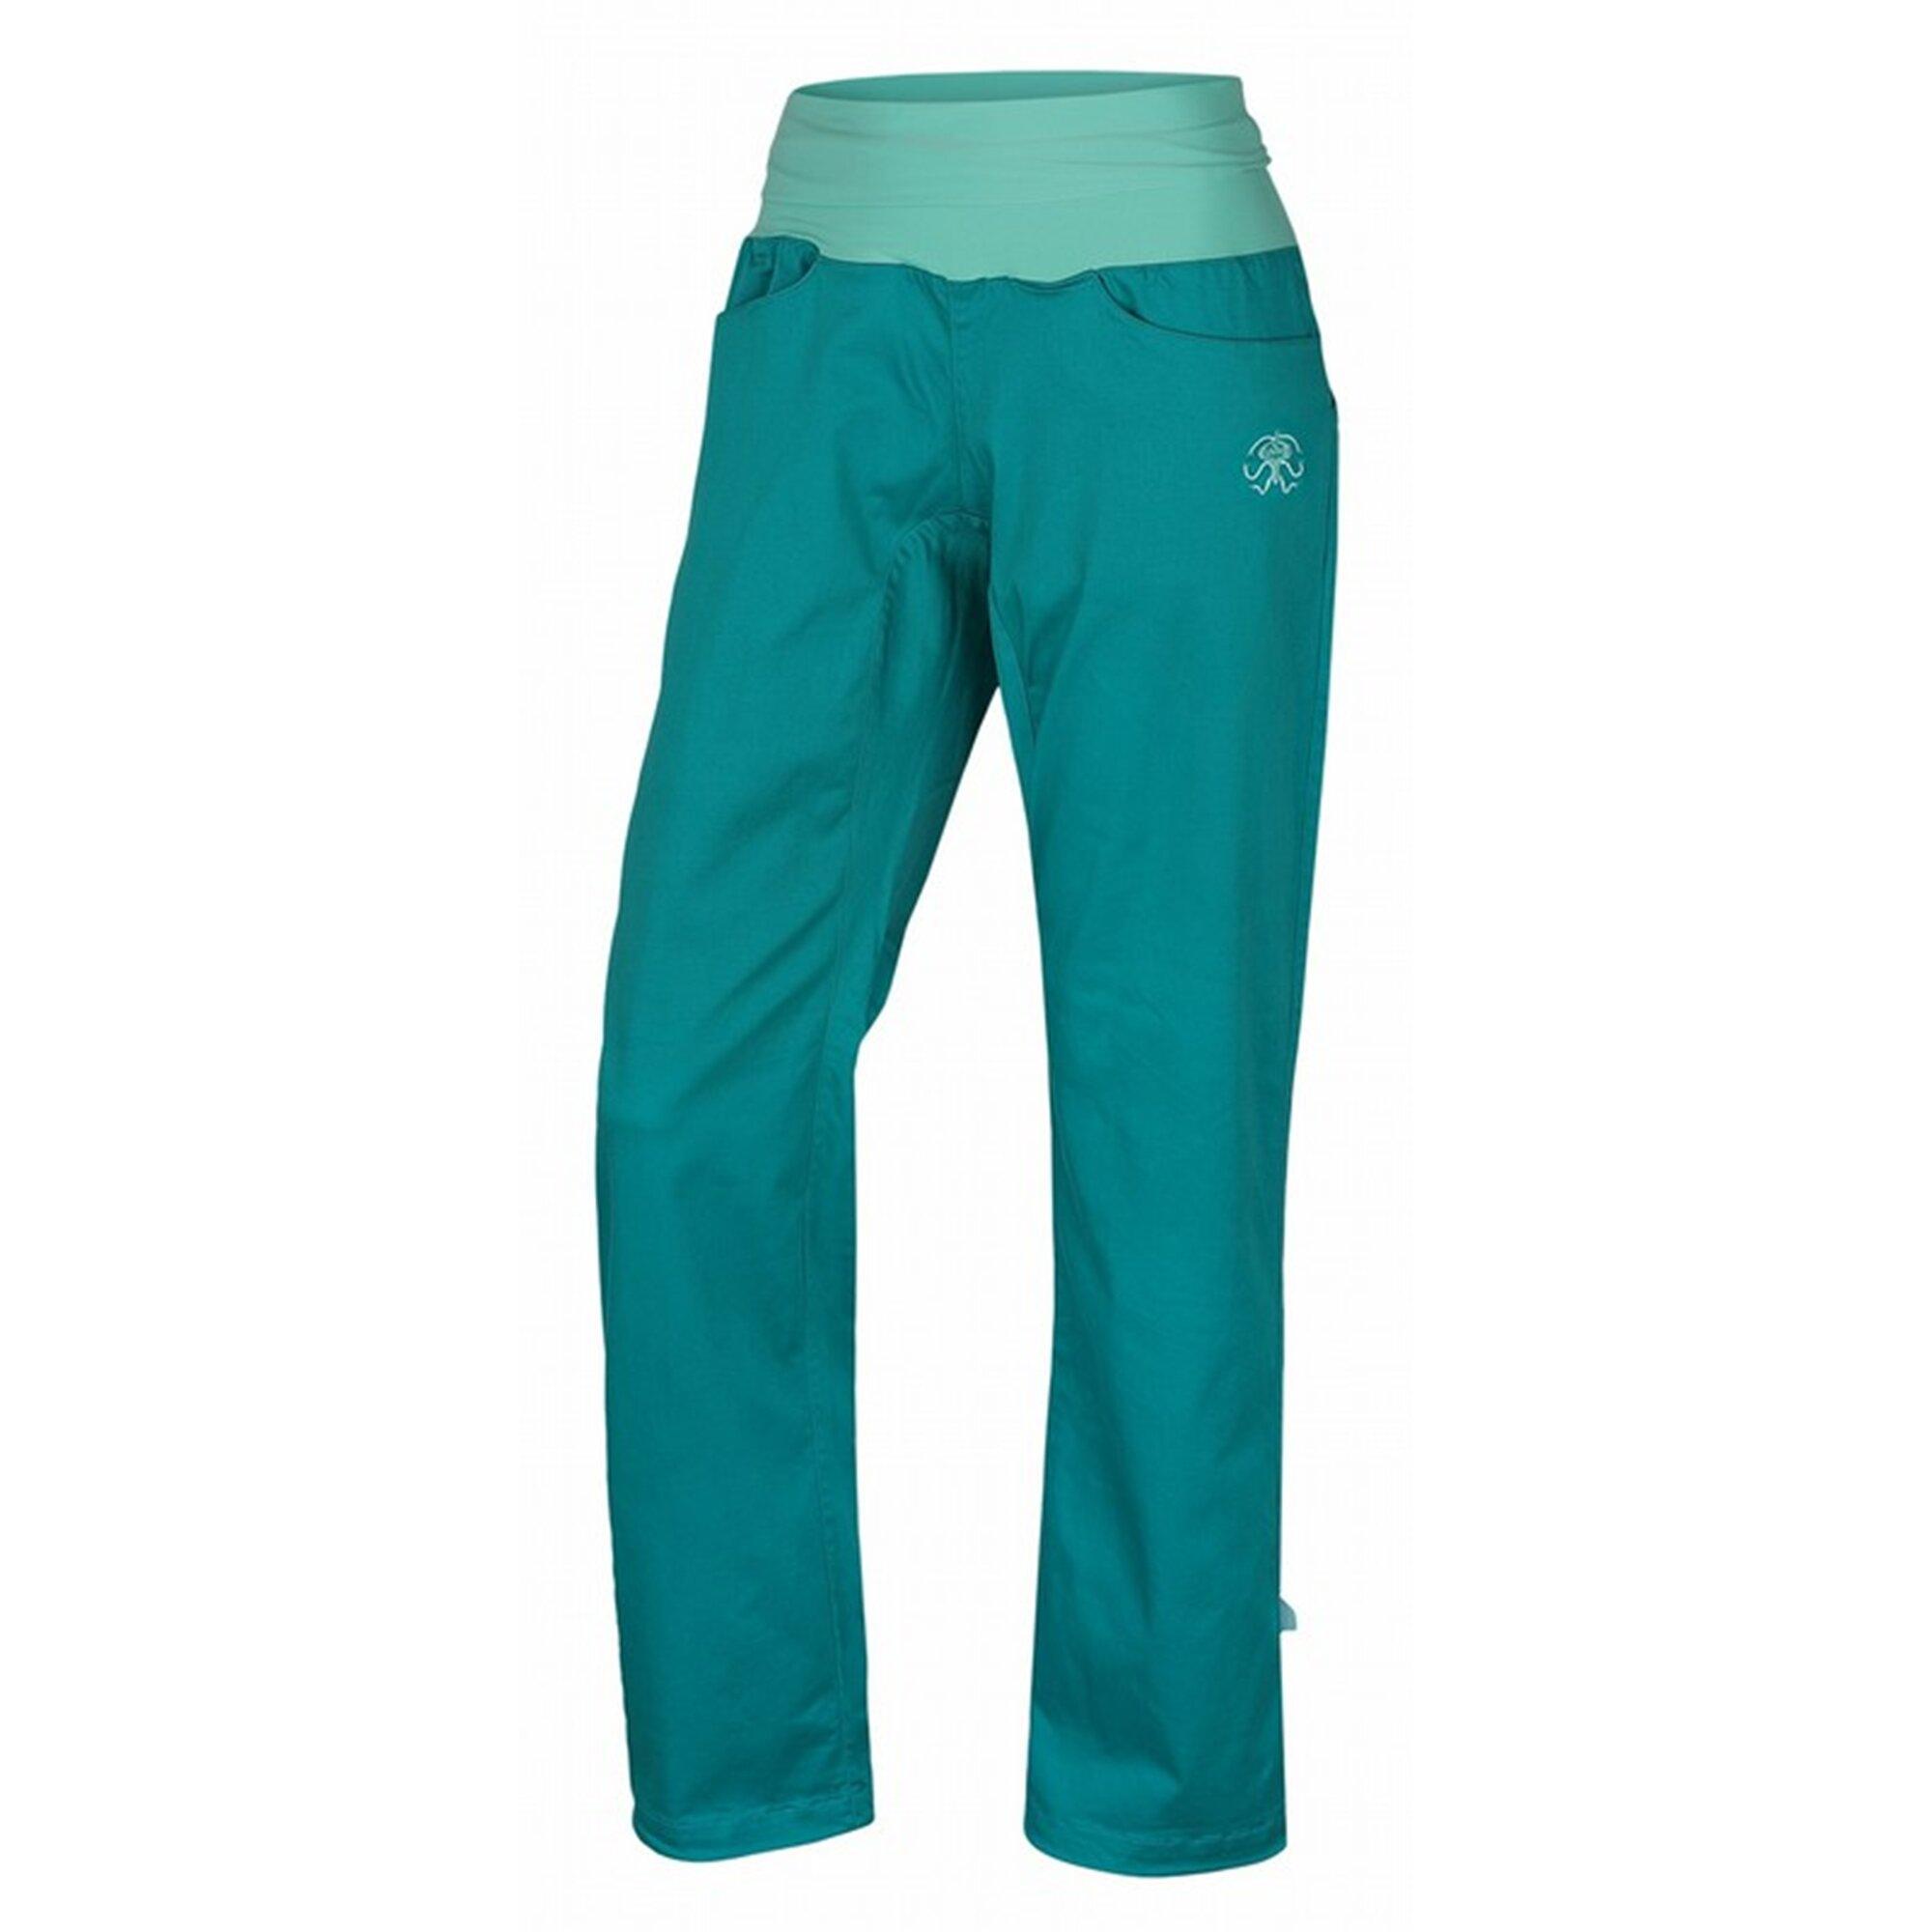 Dámské kalhoty Rafiki ETNIA M 38 - SingingRock Outlet ff803db3dc